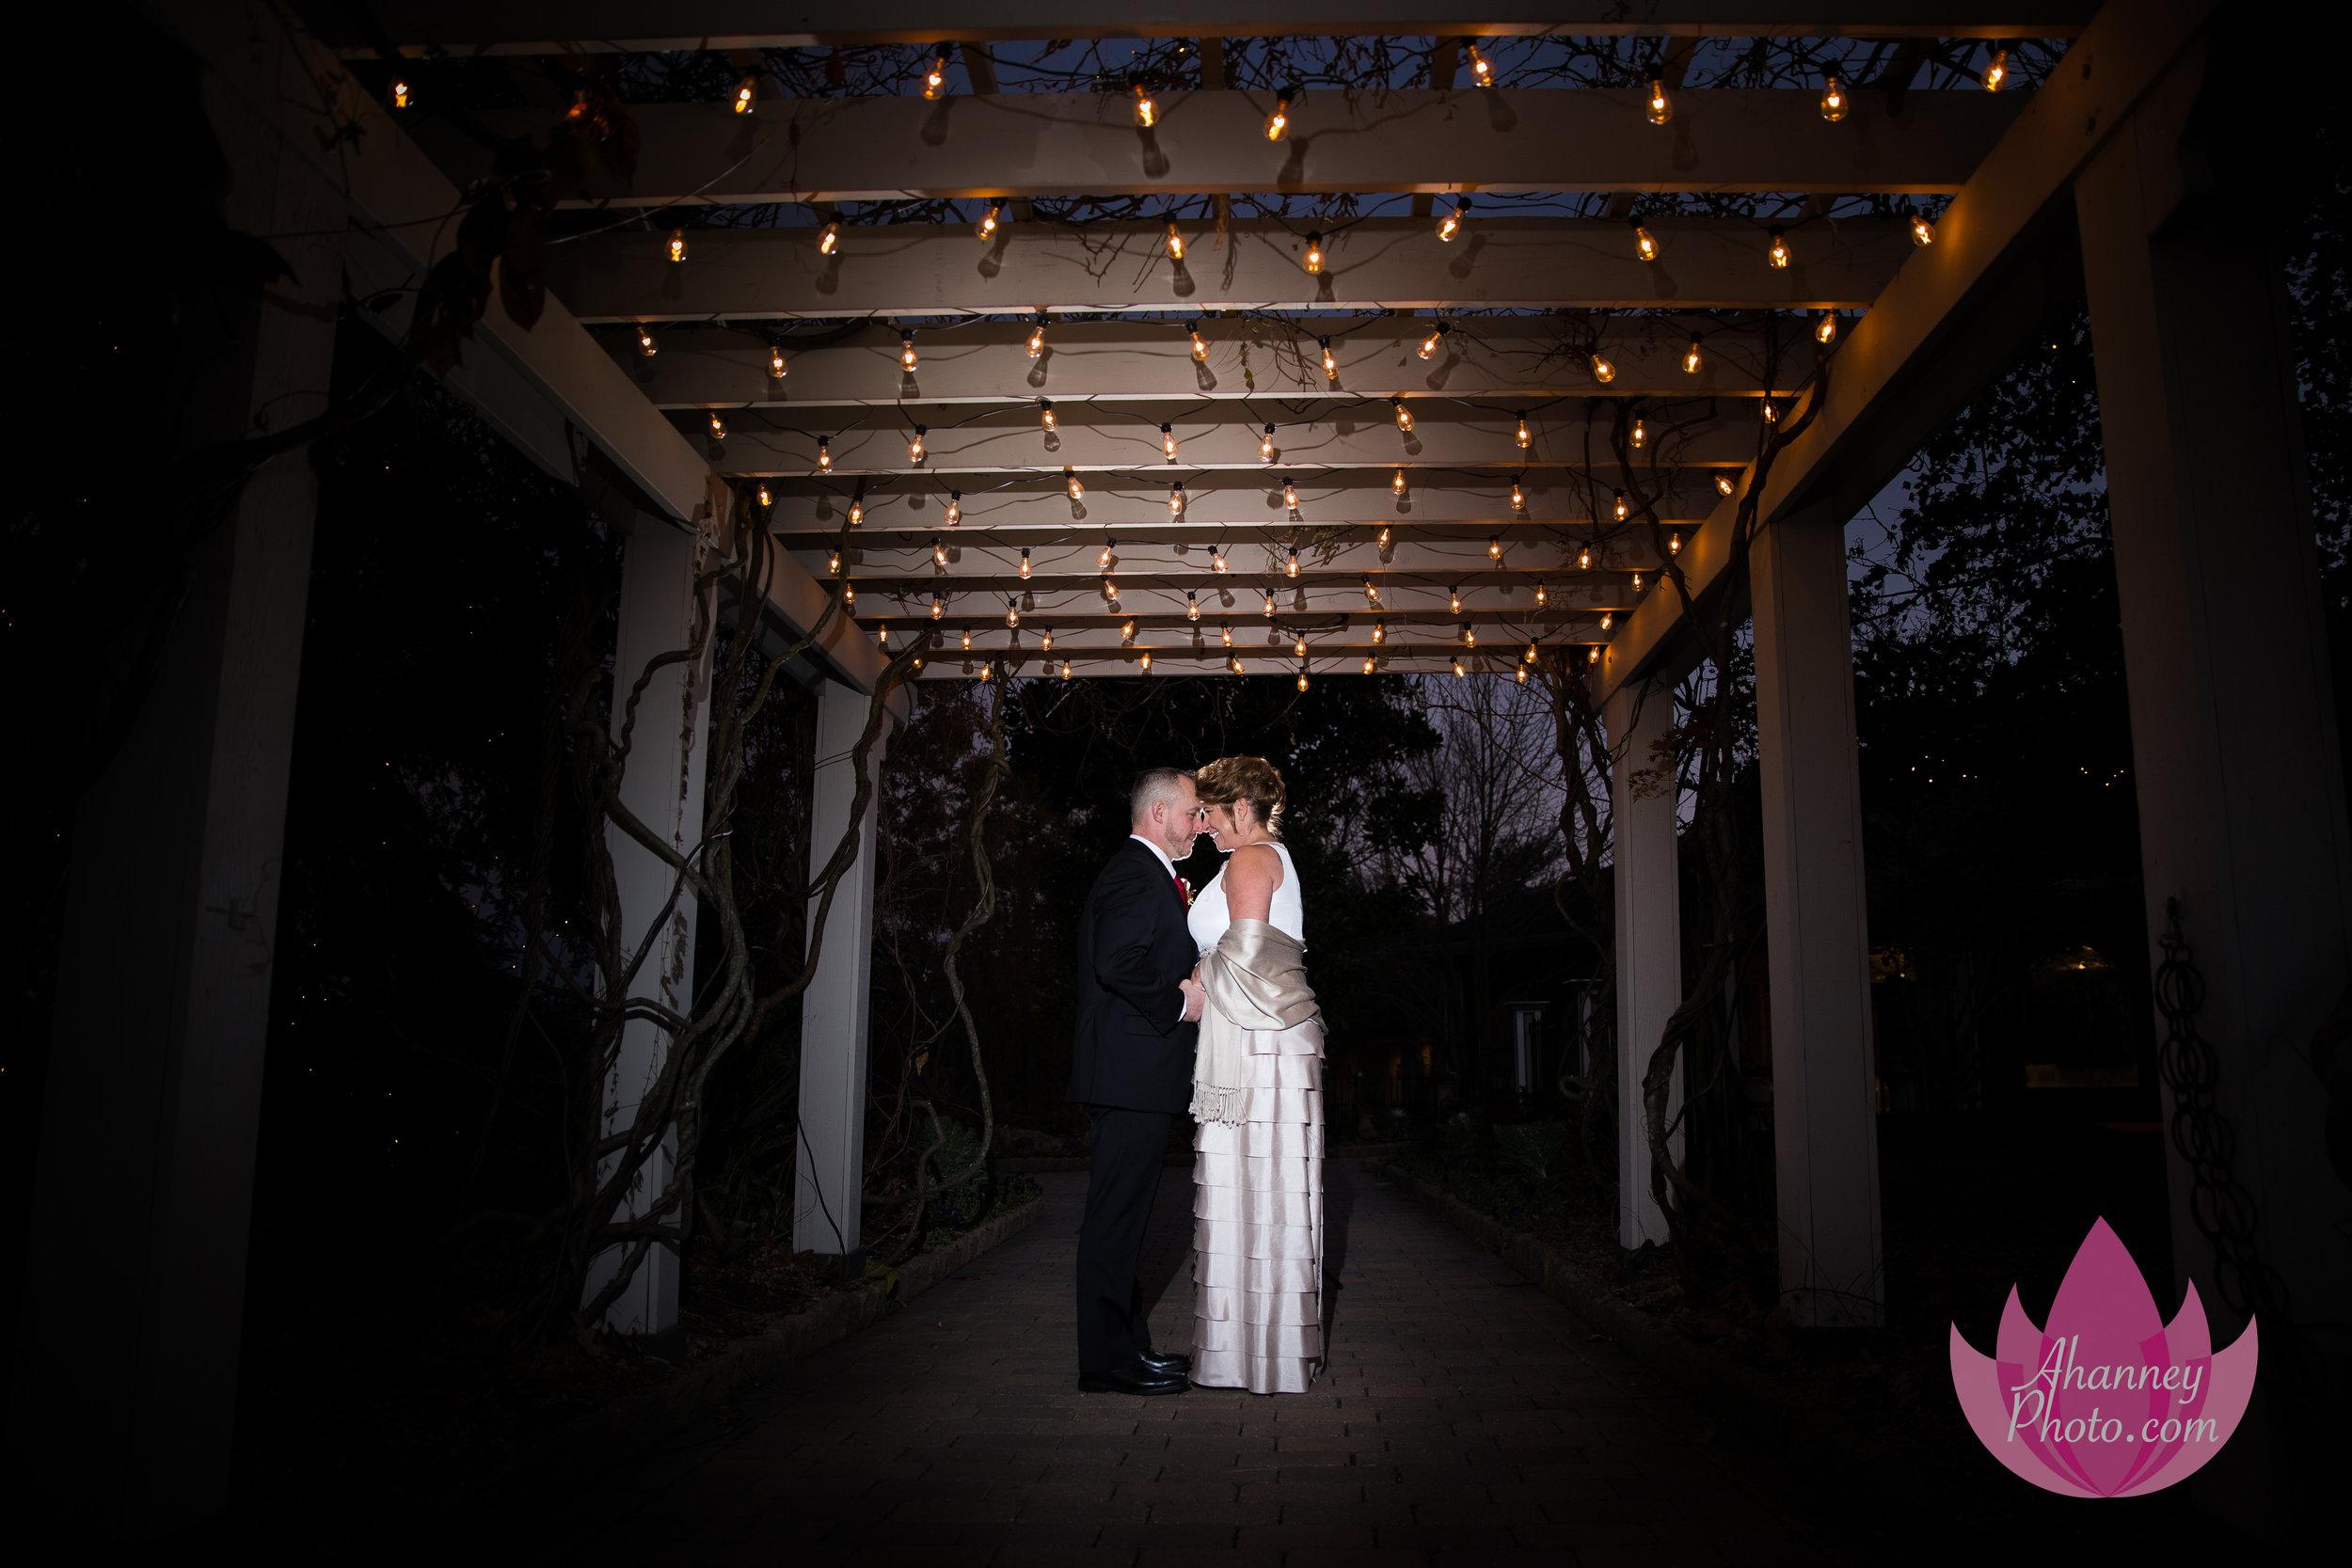 Wedding Photography of Bride and Groom Under Lights Scotland Run Golf Club Williamstown New Jersey Anastsia Hanney Photography AHanneyPhoto